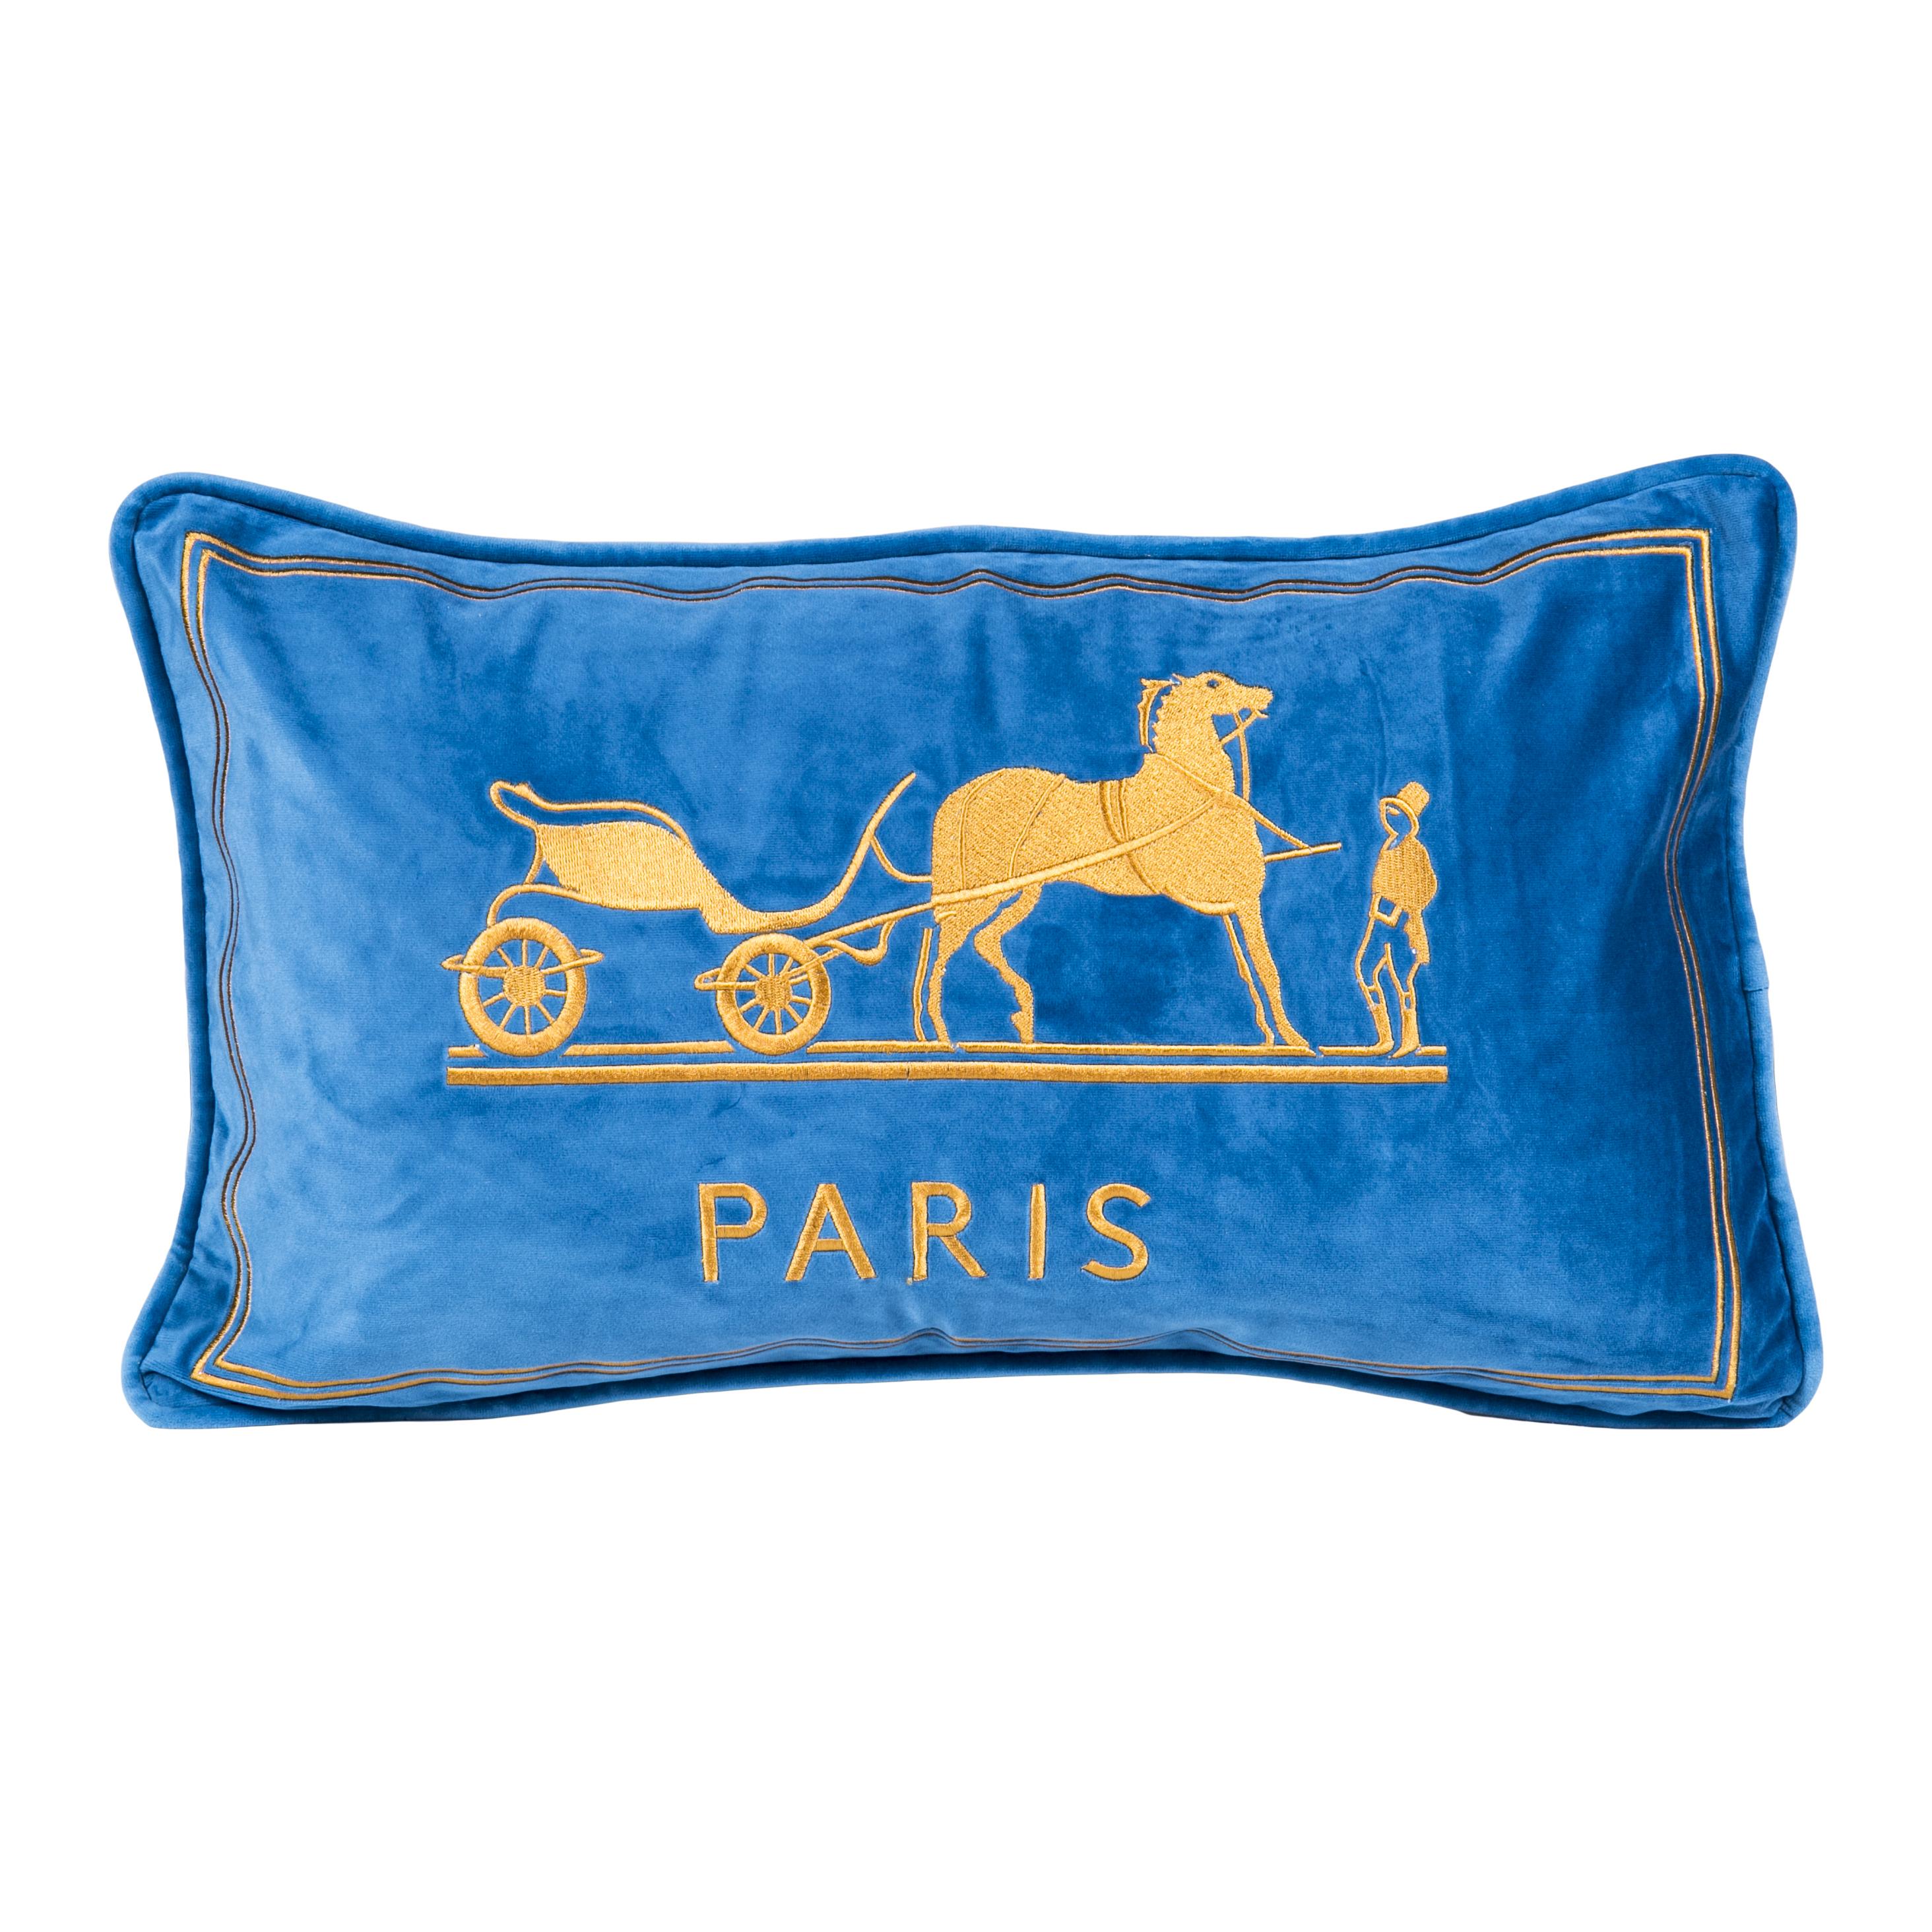 Декоративная подушка Old Paris голубого цвета